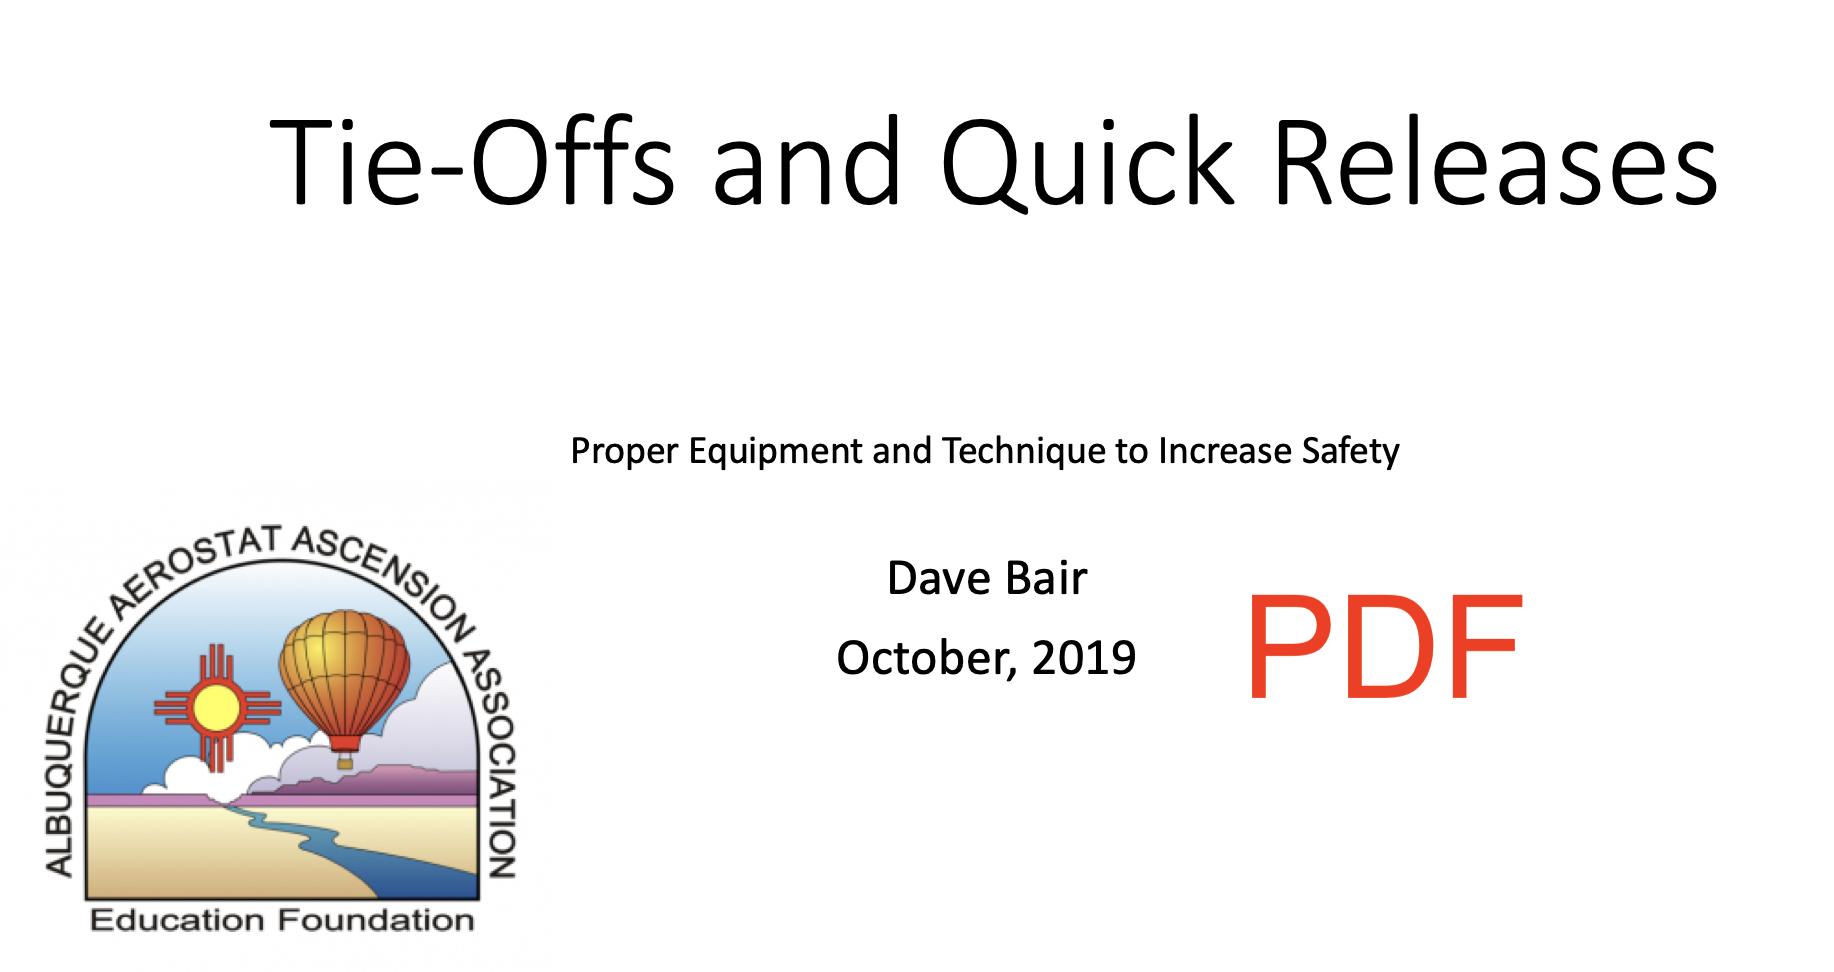 PDF of Slides